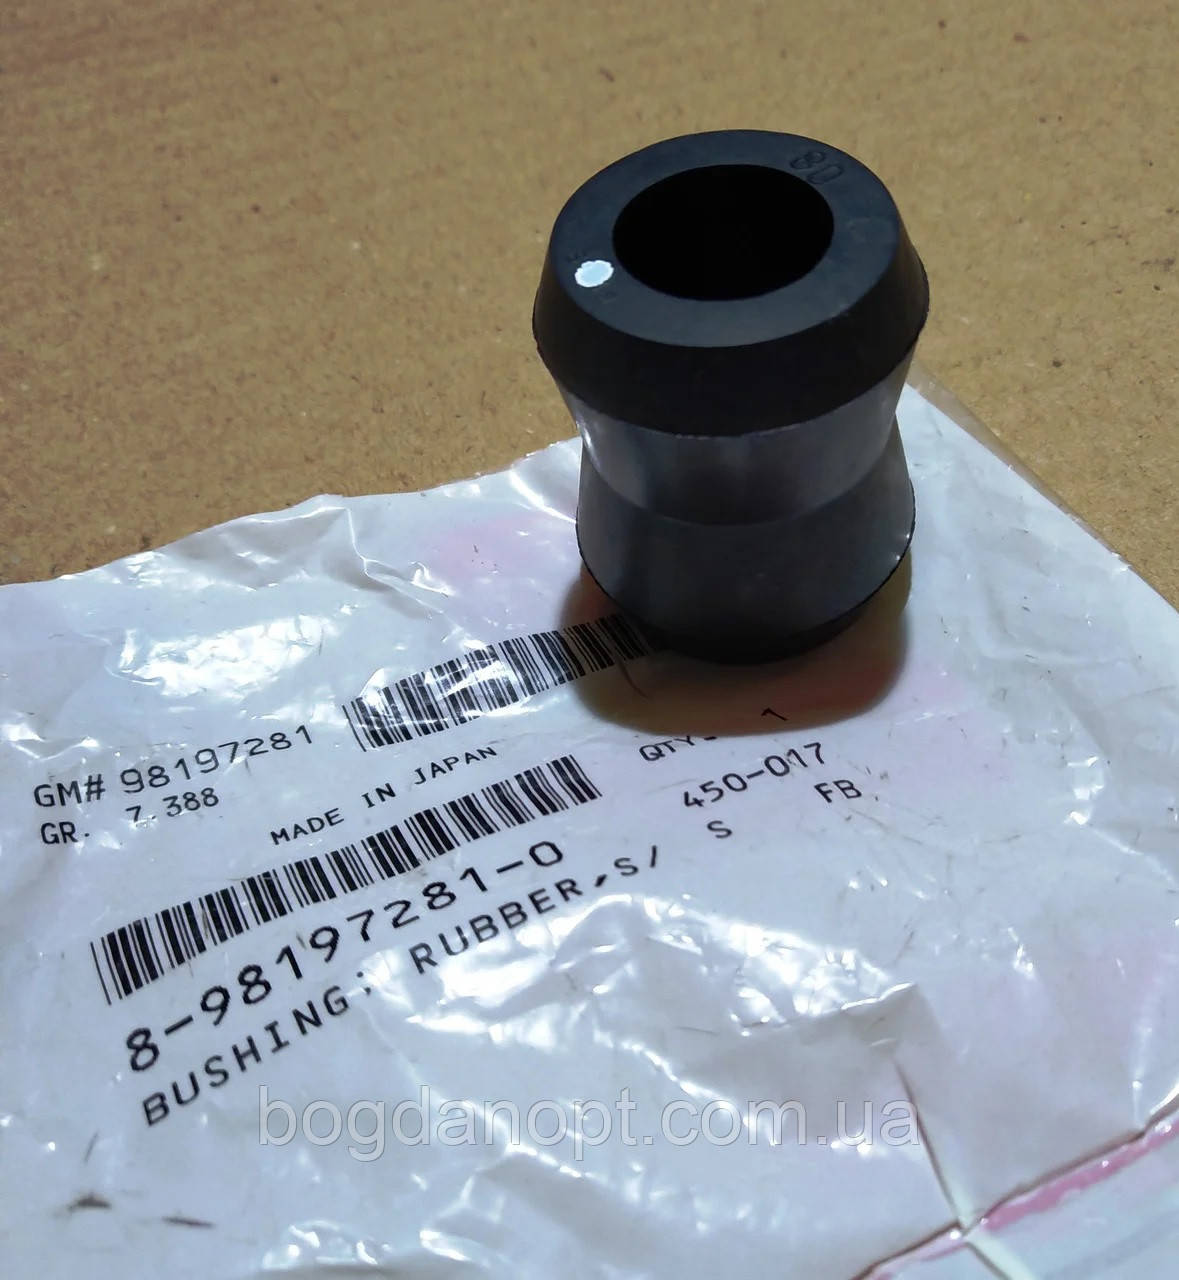 Втулка амортизатора ISUZU NLR 85 переднего  8981972810